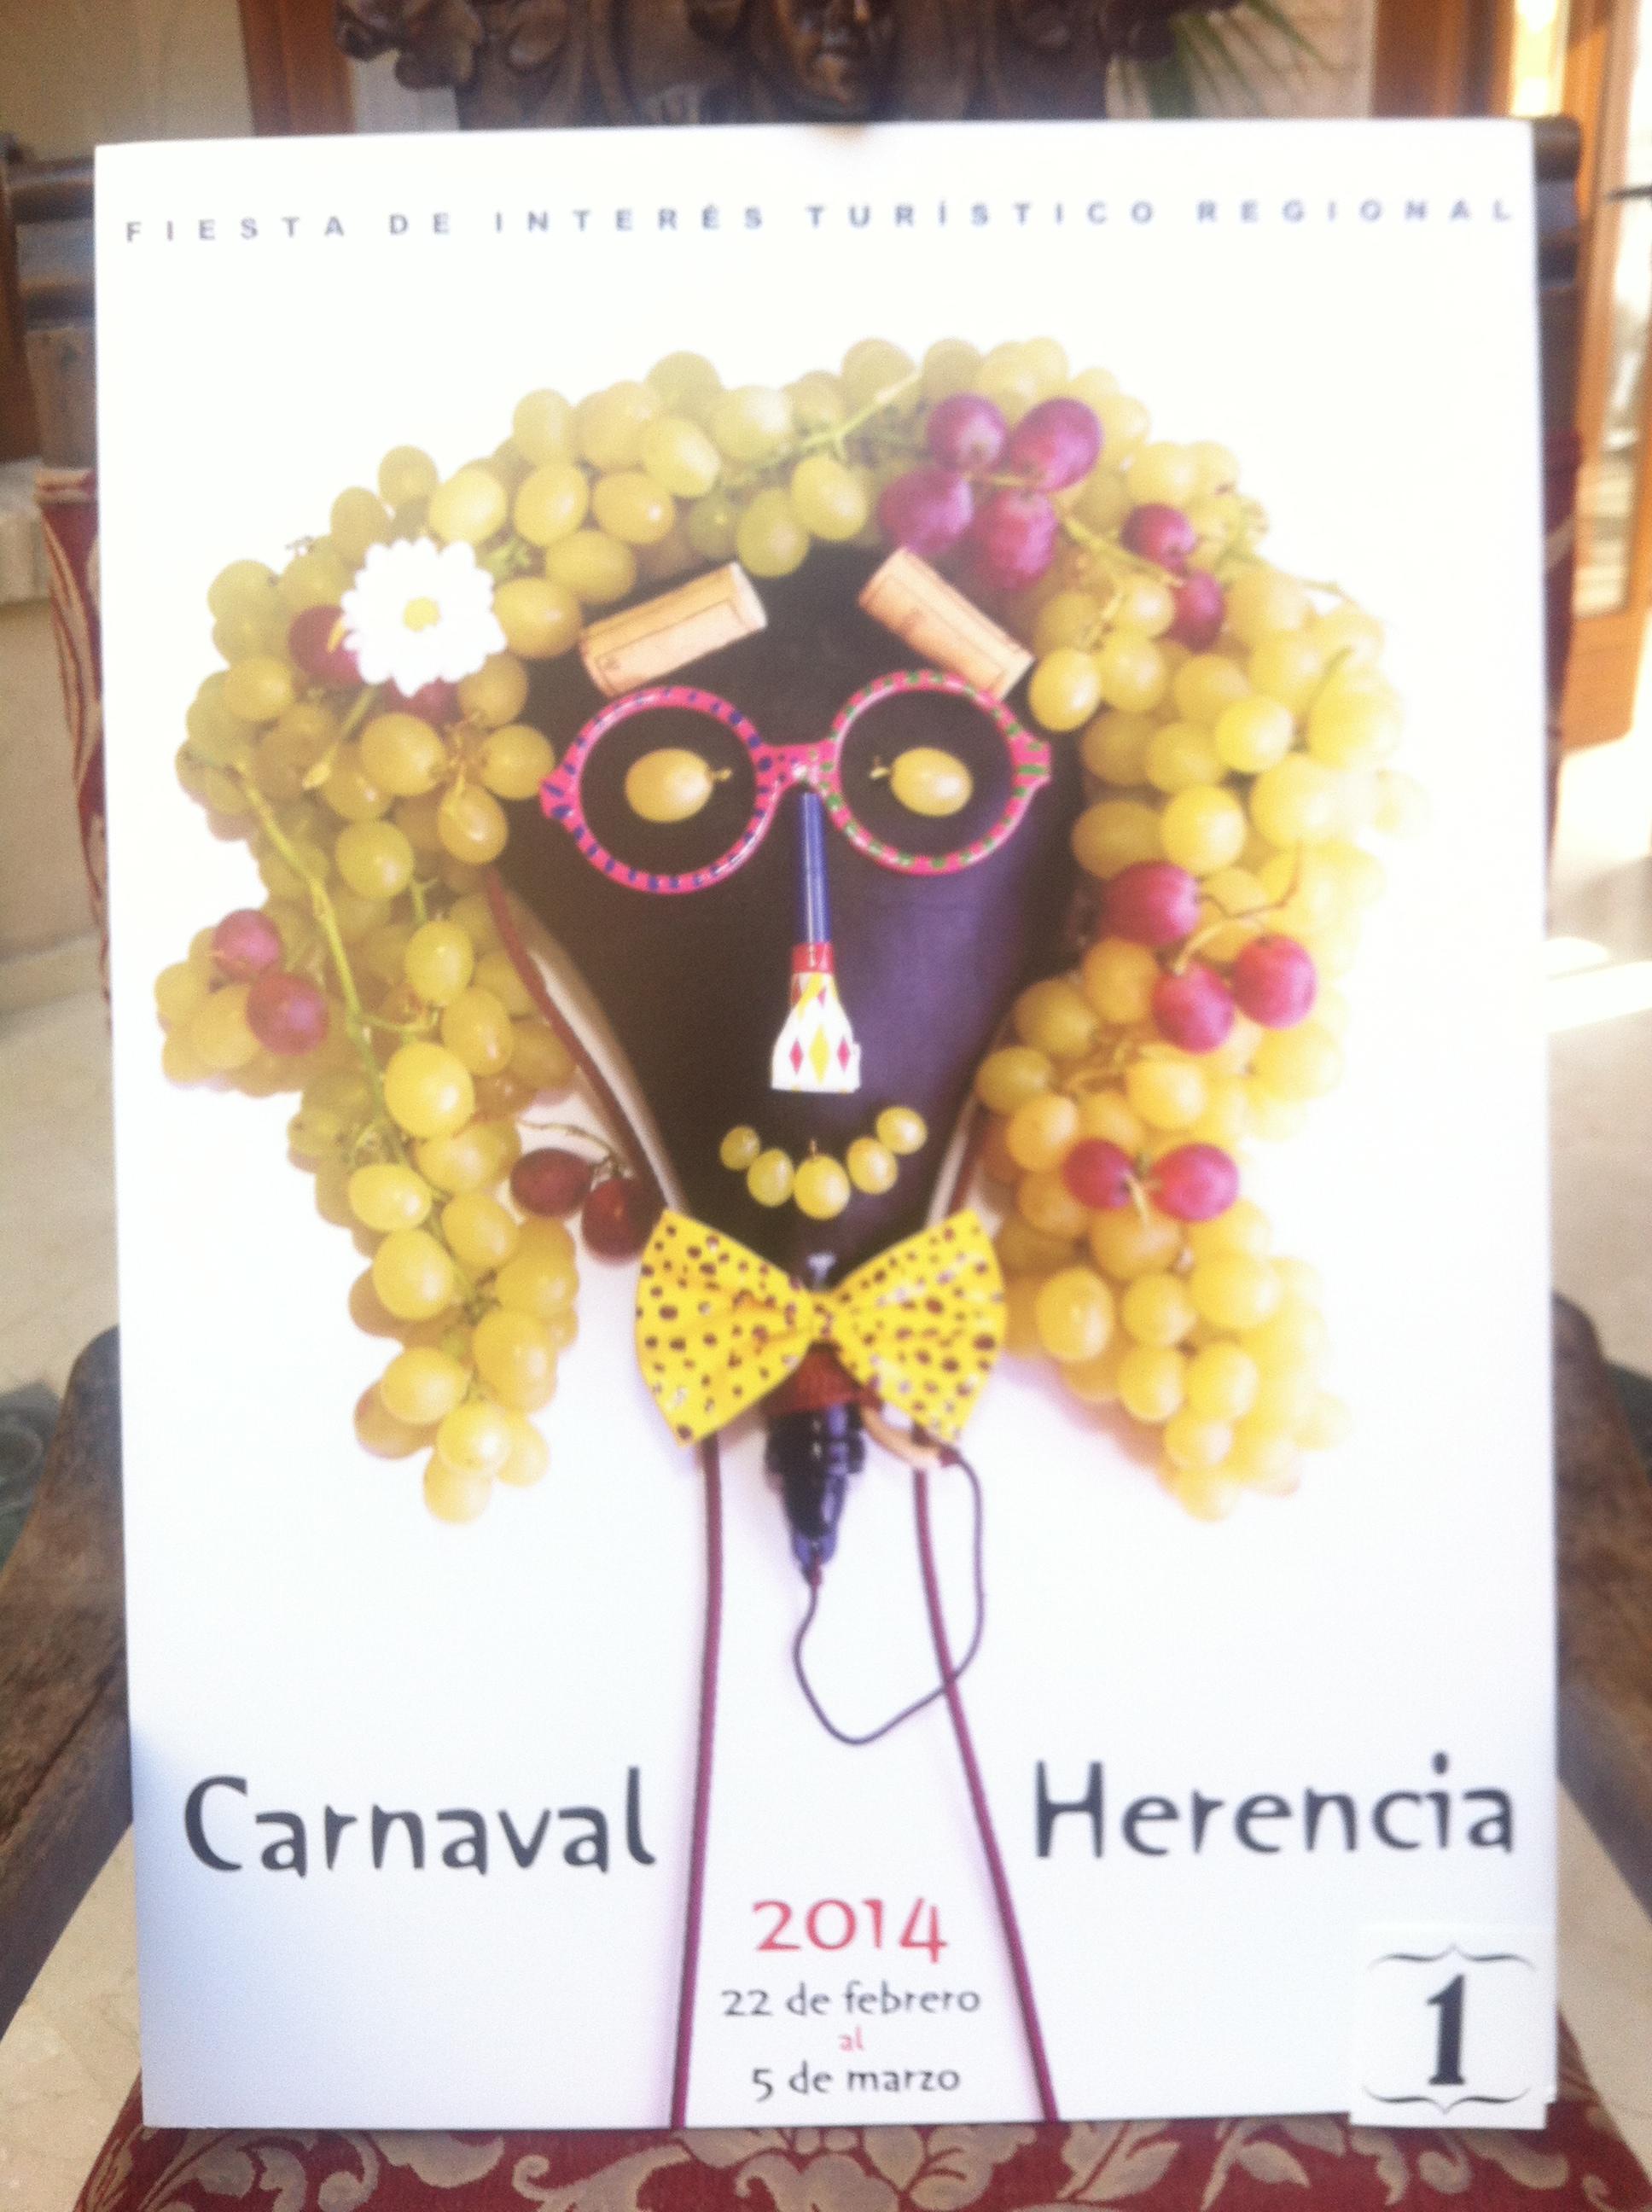 Concurso Carteles Carnaval 2014 (1)